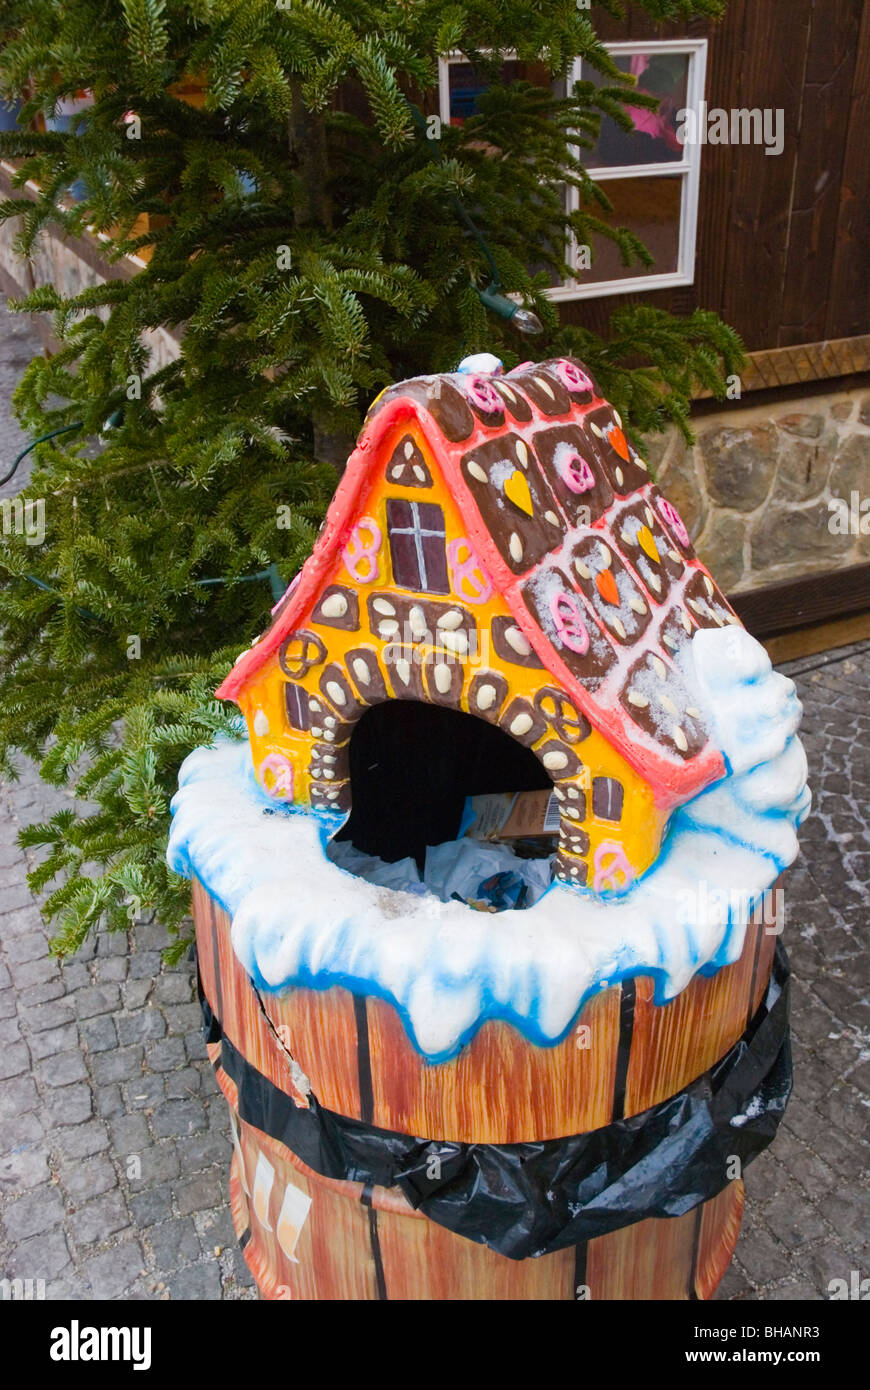 Christmas themed rubbish bin Residenz Christmas market Munich Bavaria Germany Europe - Stock Image